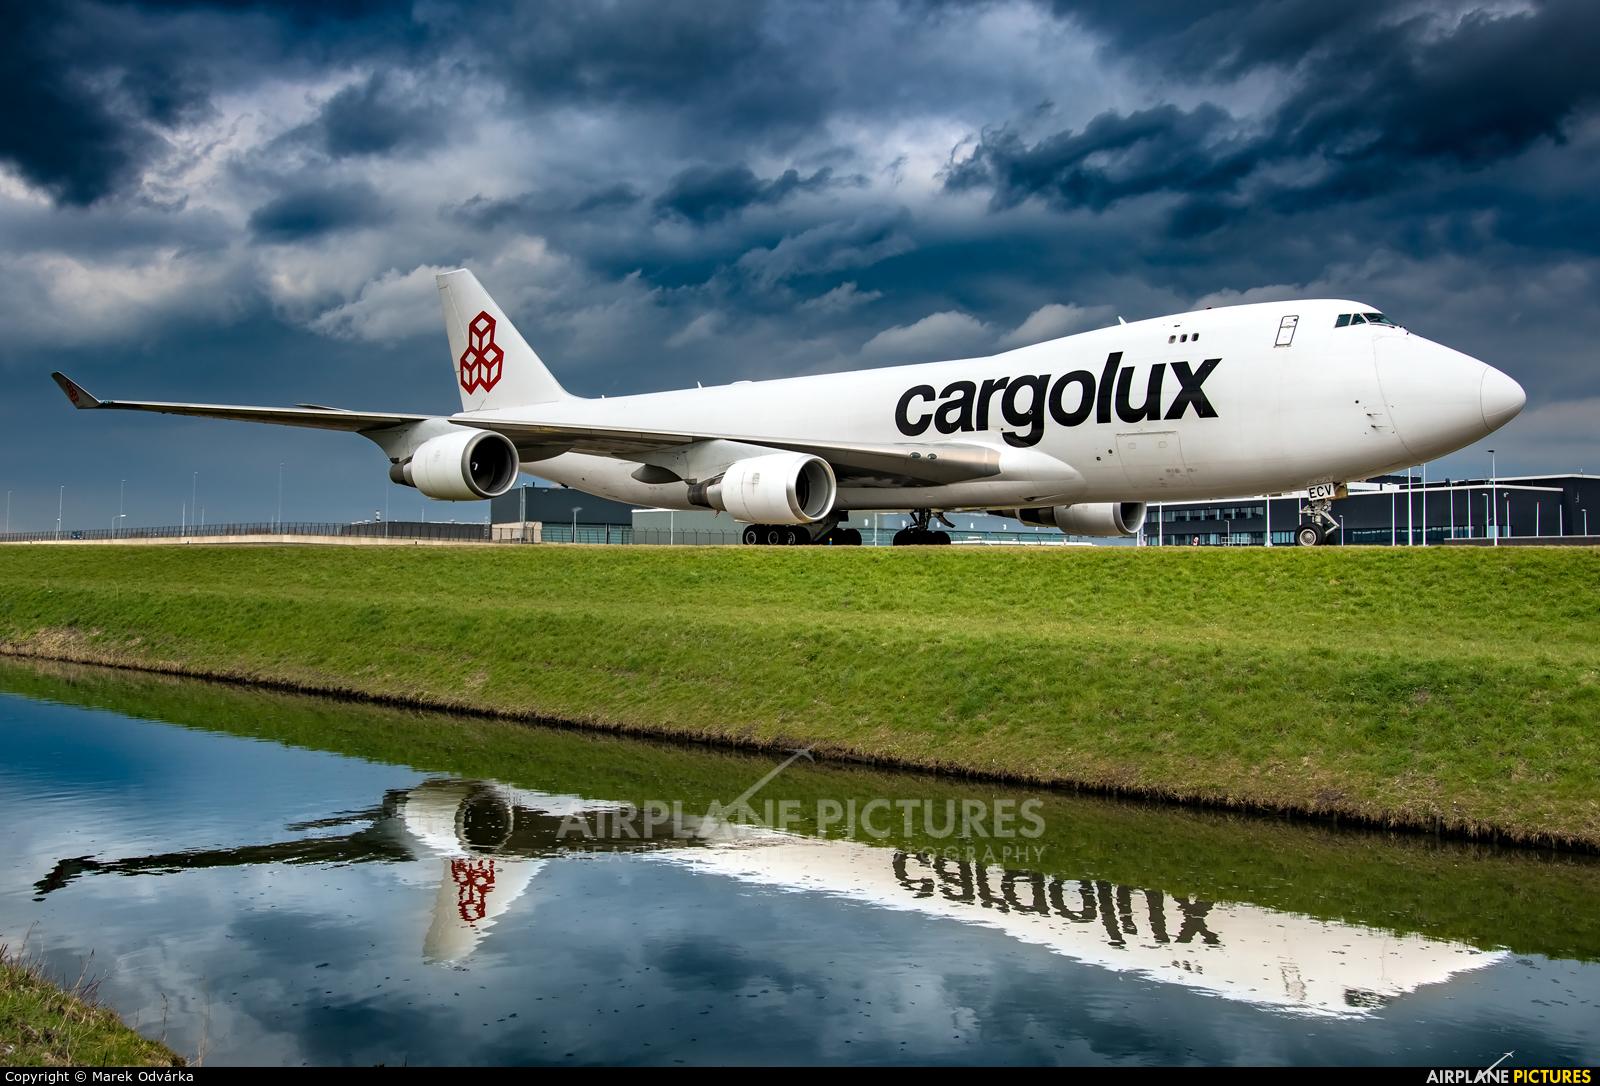 Cargolux LX-ECV aircraft at Amsterdam - Schiphol